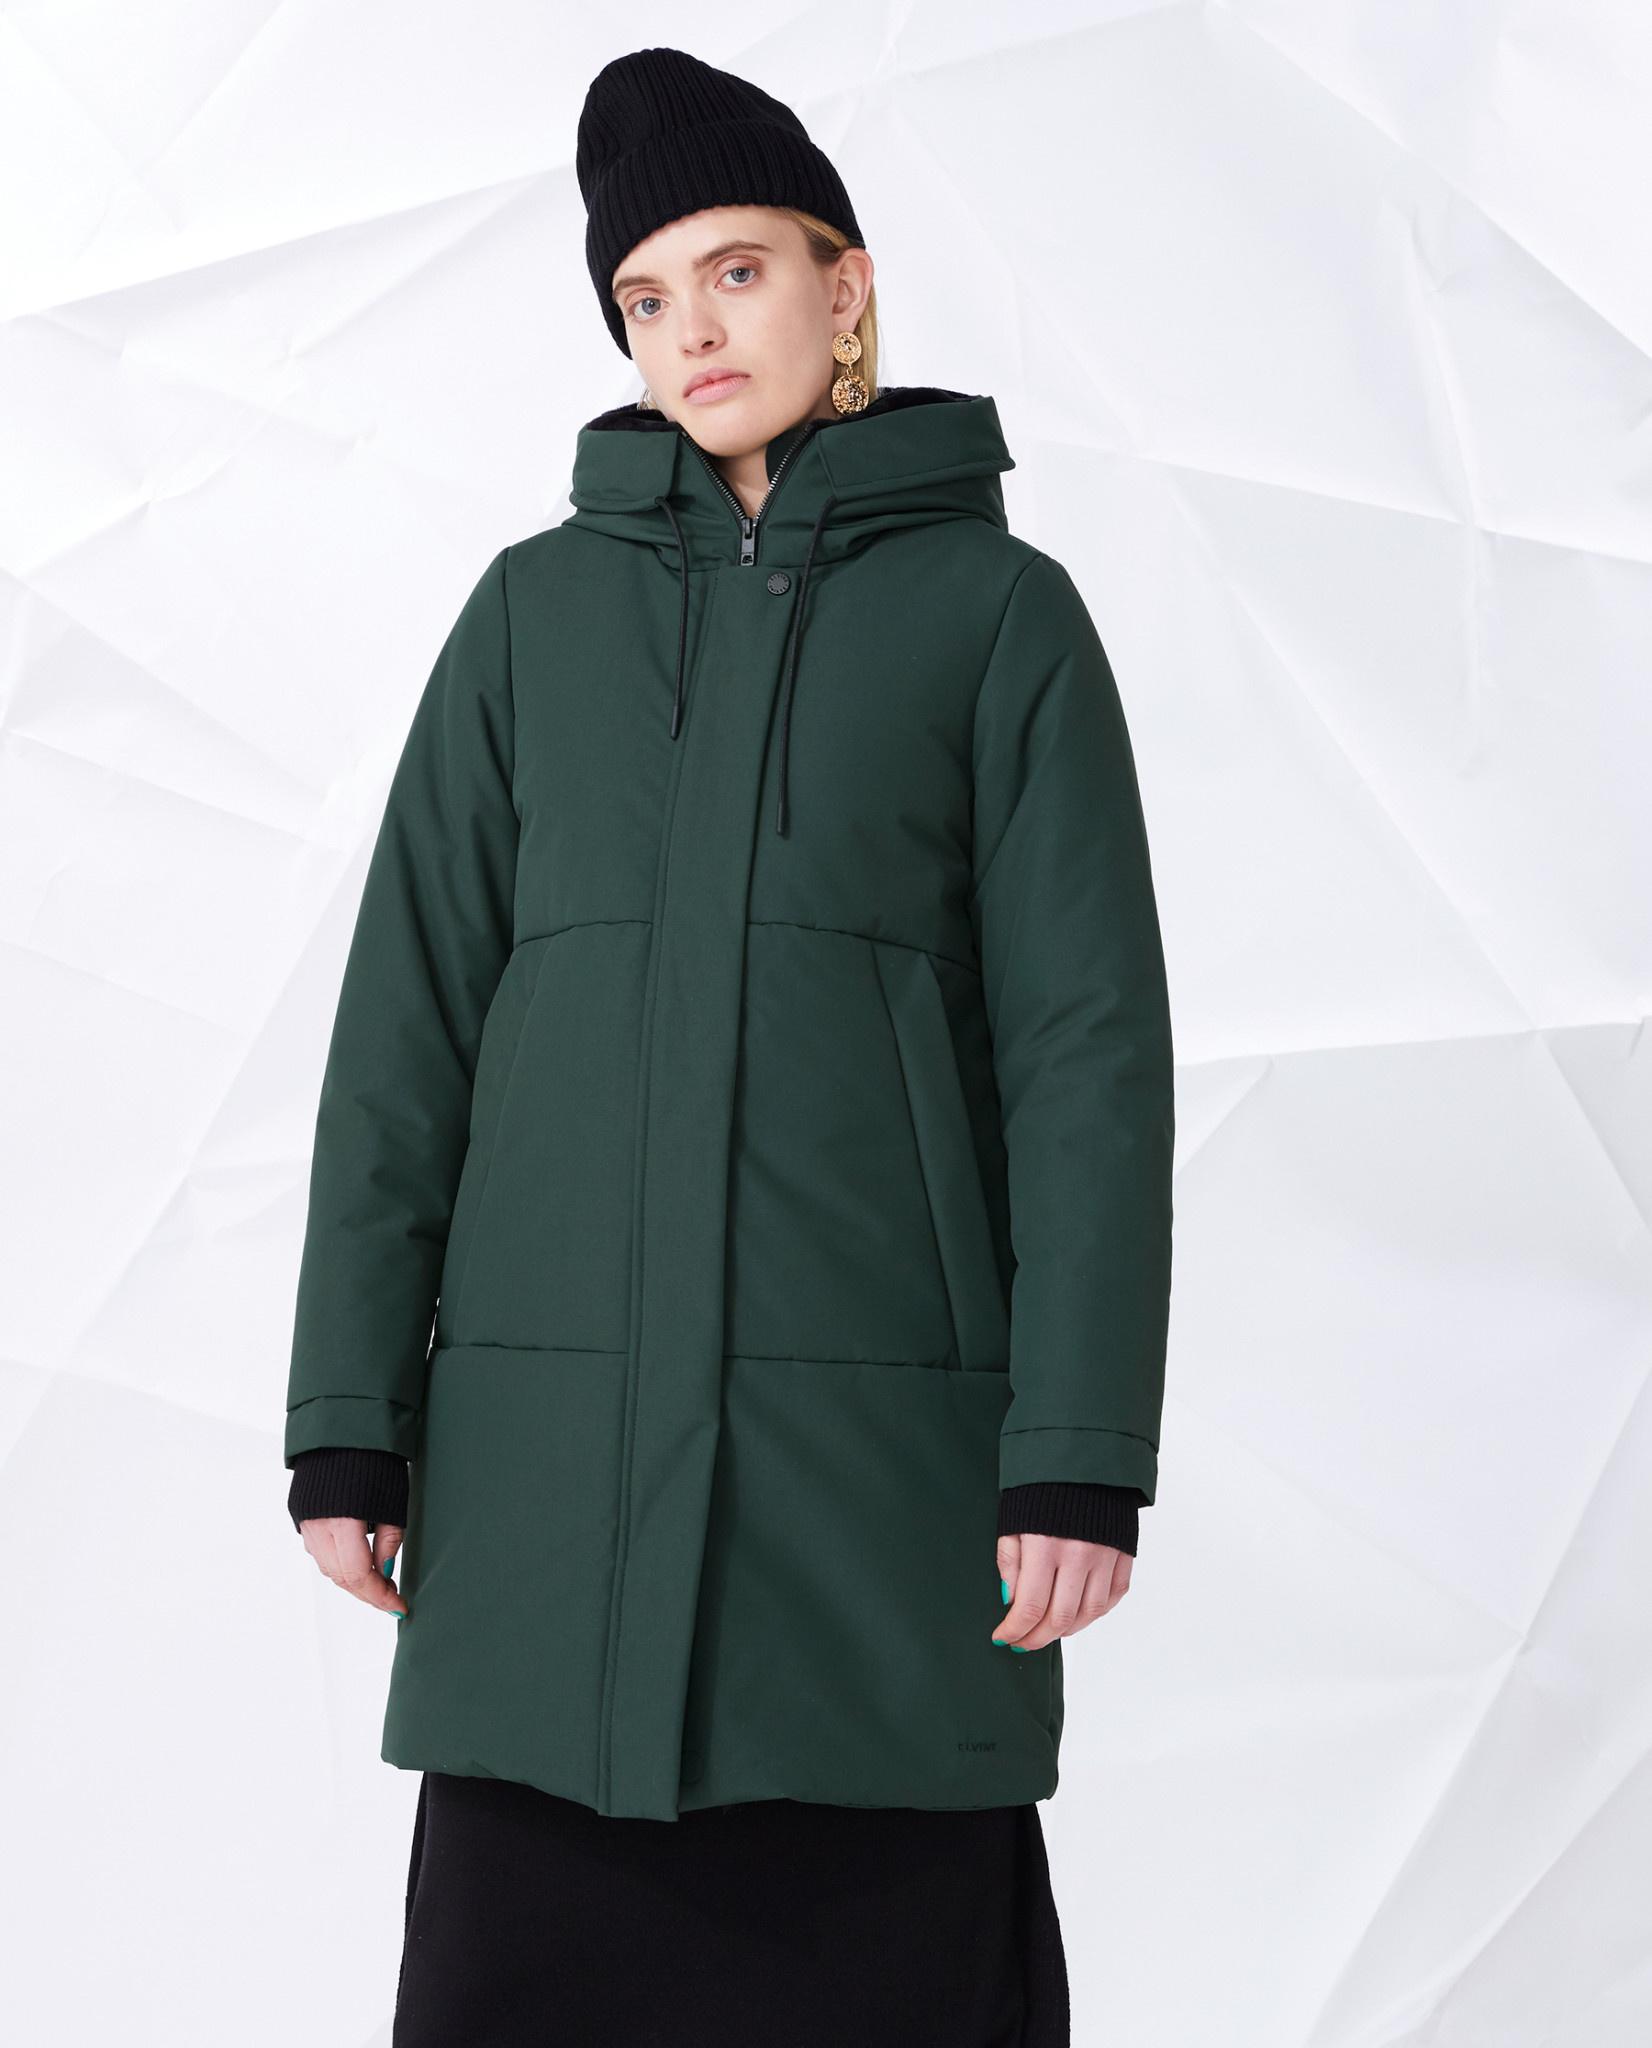 Elvine Elvine Tiril Jacket Bottle Green